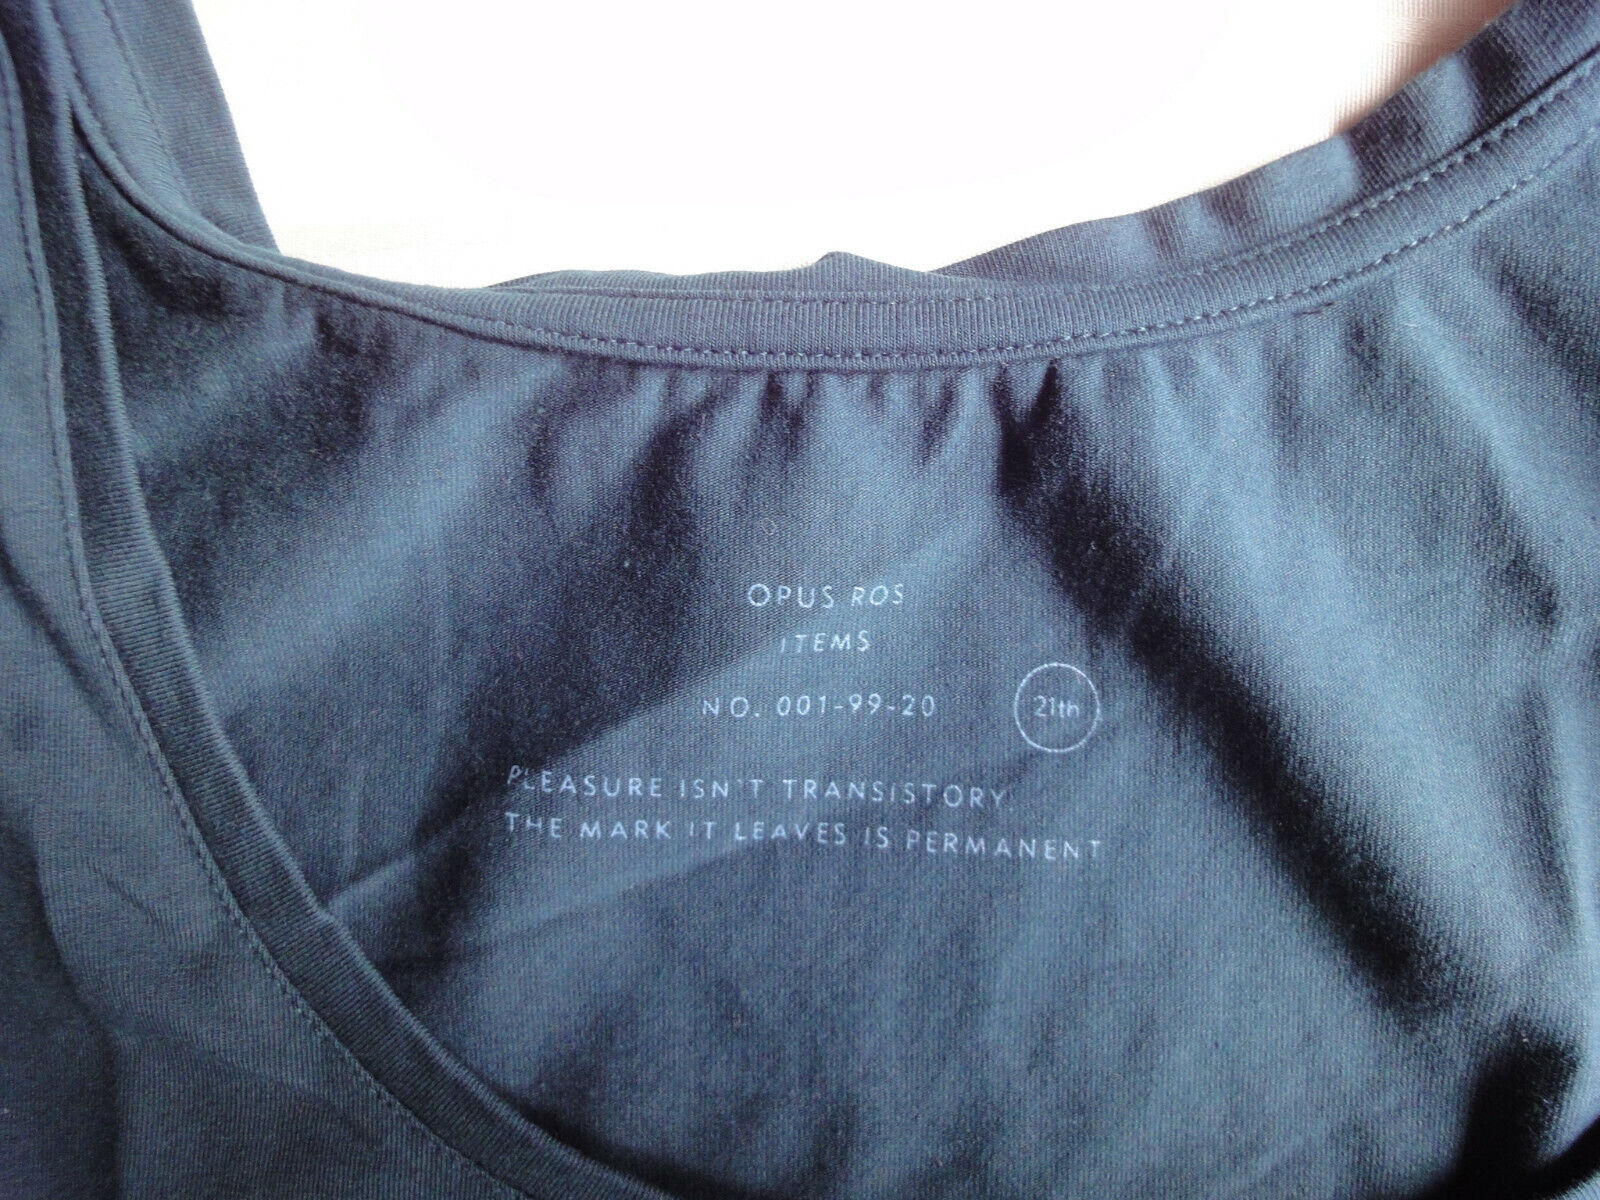 *** Damen T-Shirt - Damenshirt - Marke - OPUS ROS - siehe Fotos ***